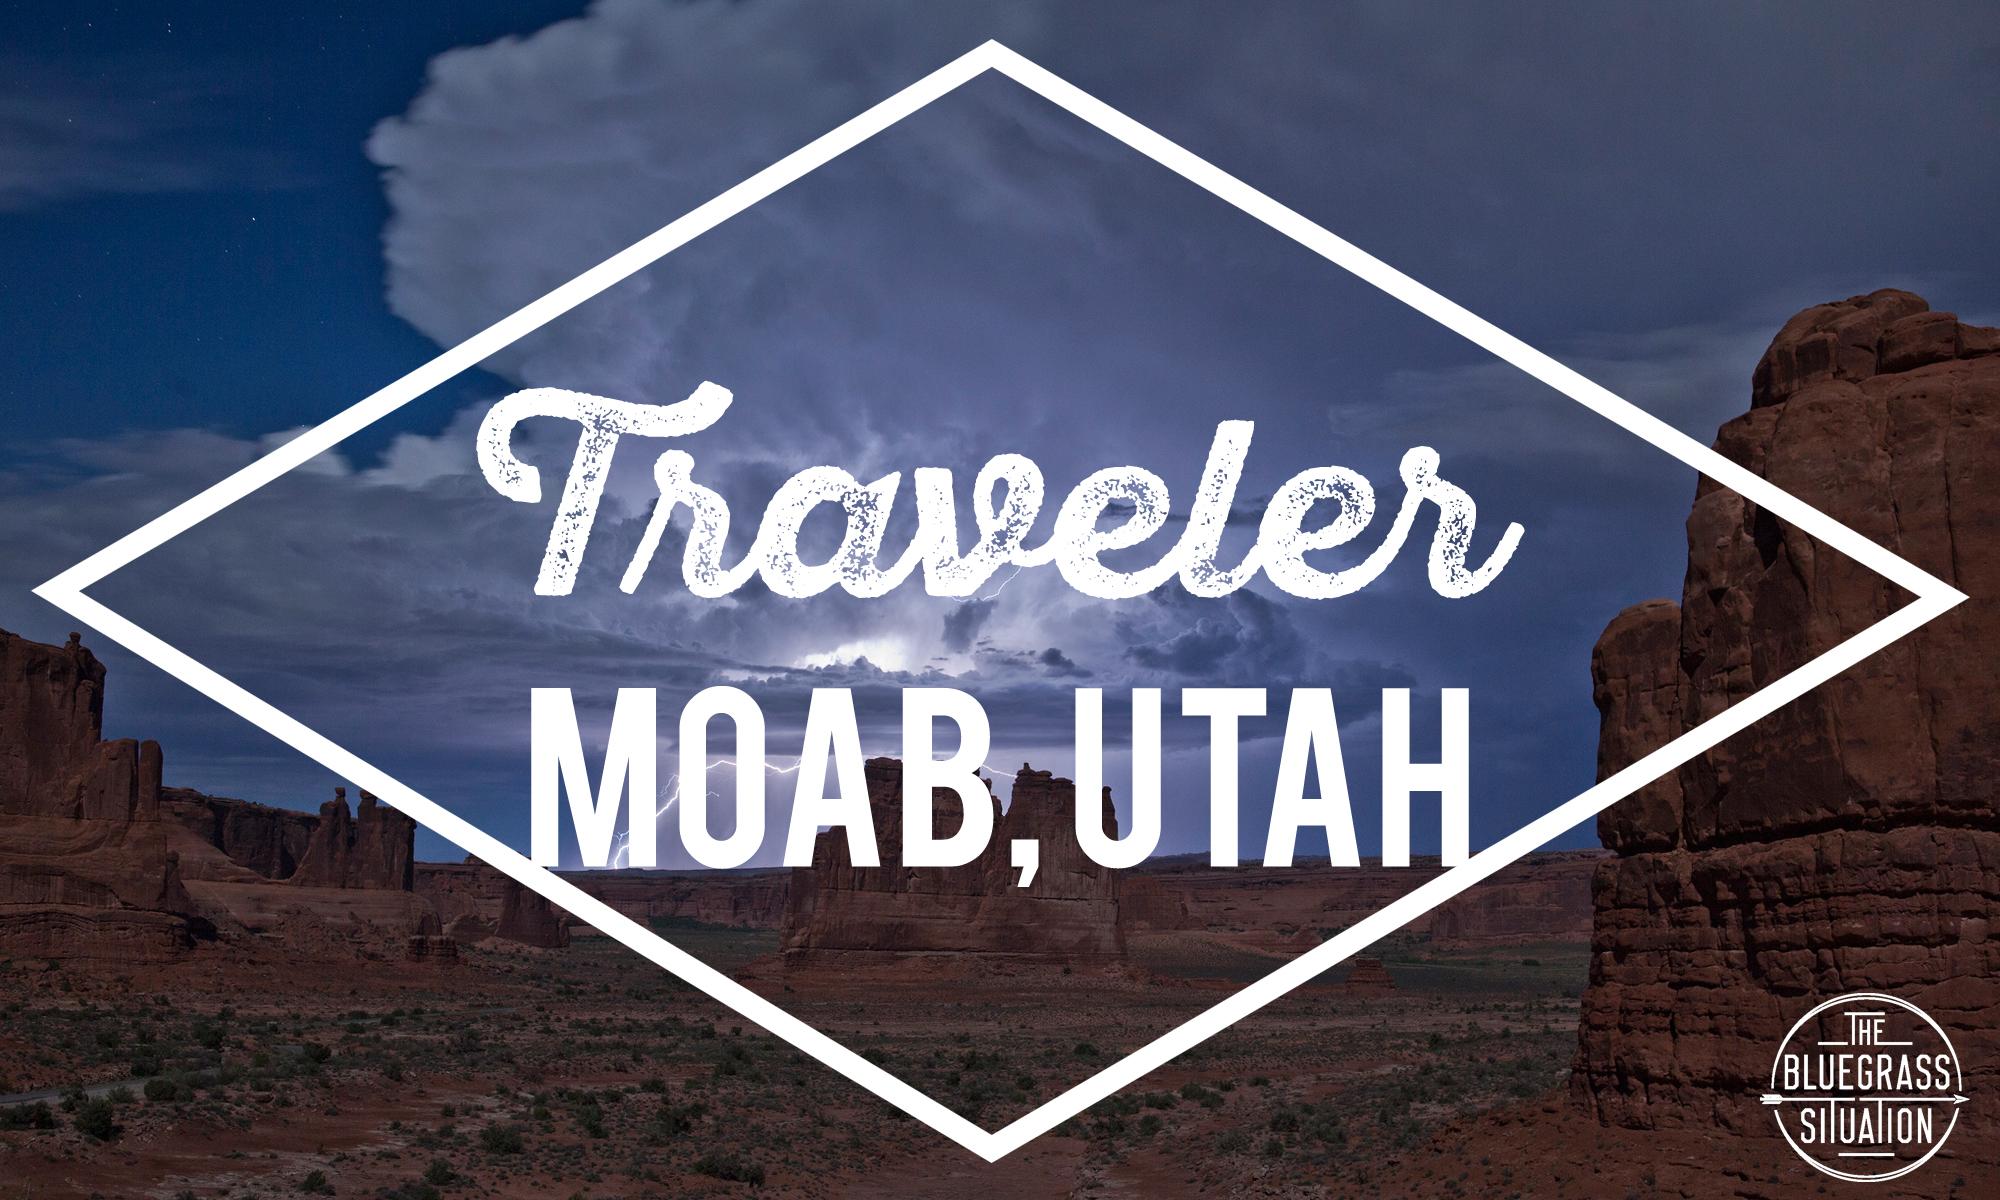 Traveler: Your Guide to Moab, Utah